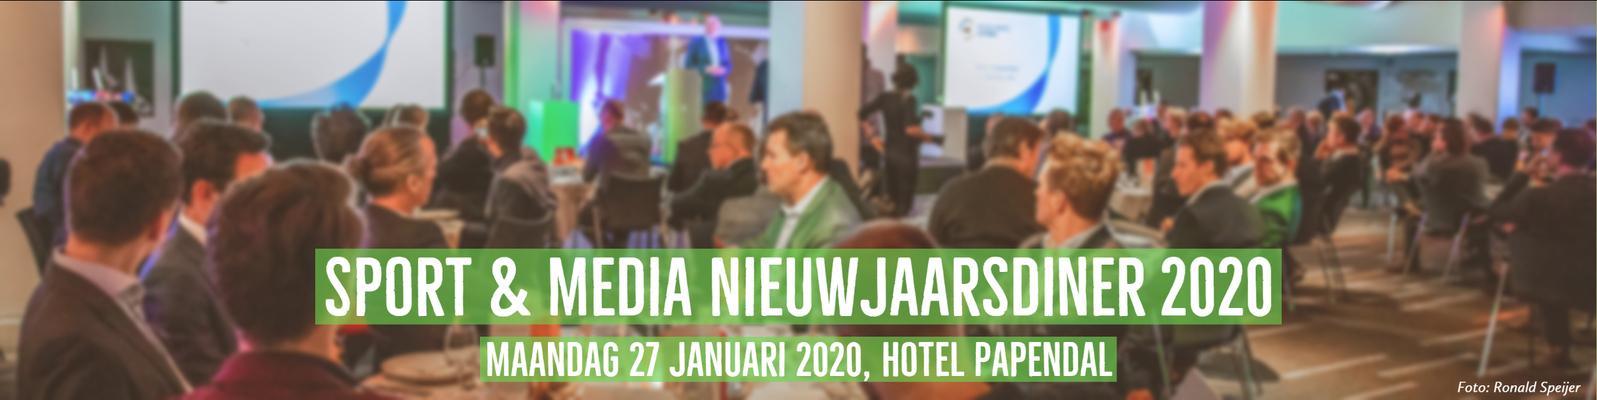 Sport & Media Nieuwjaarsdiner 2020